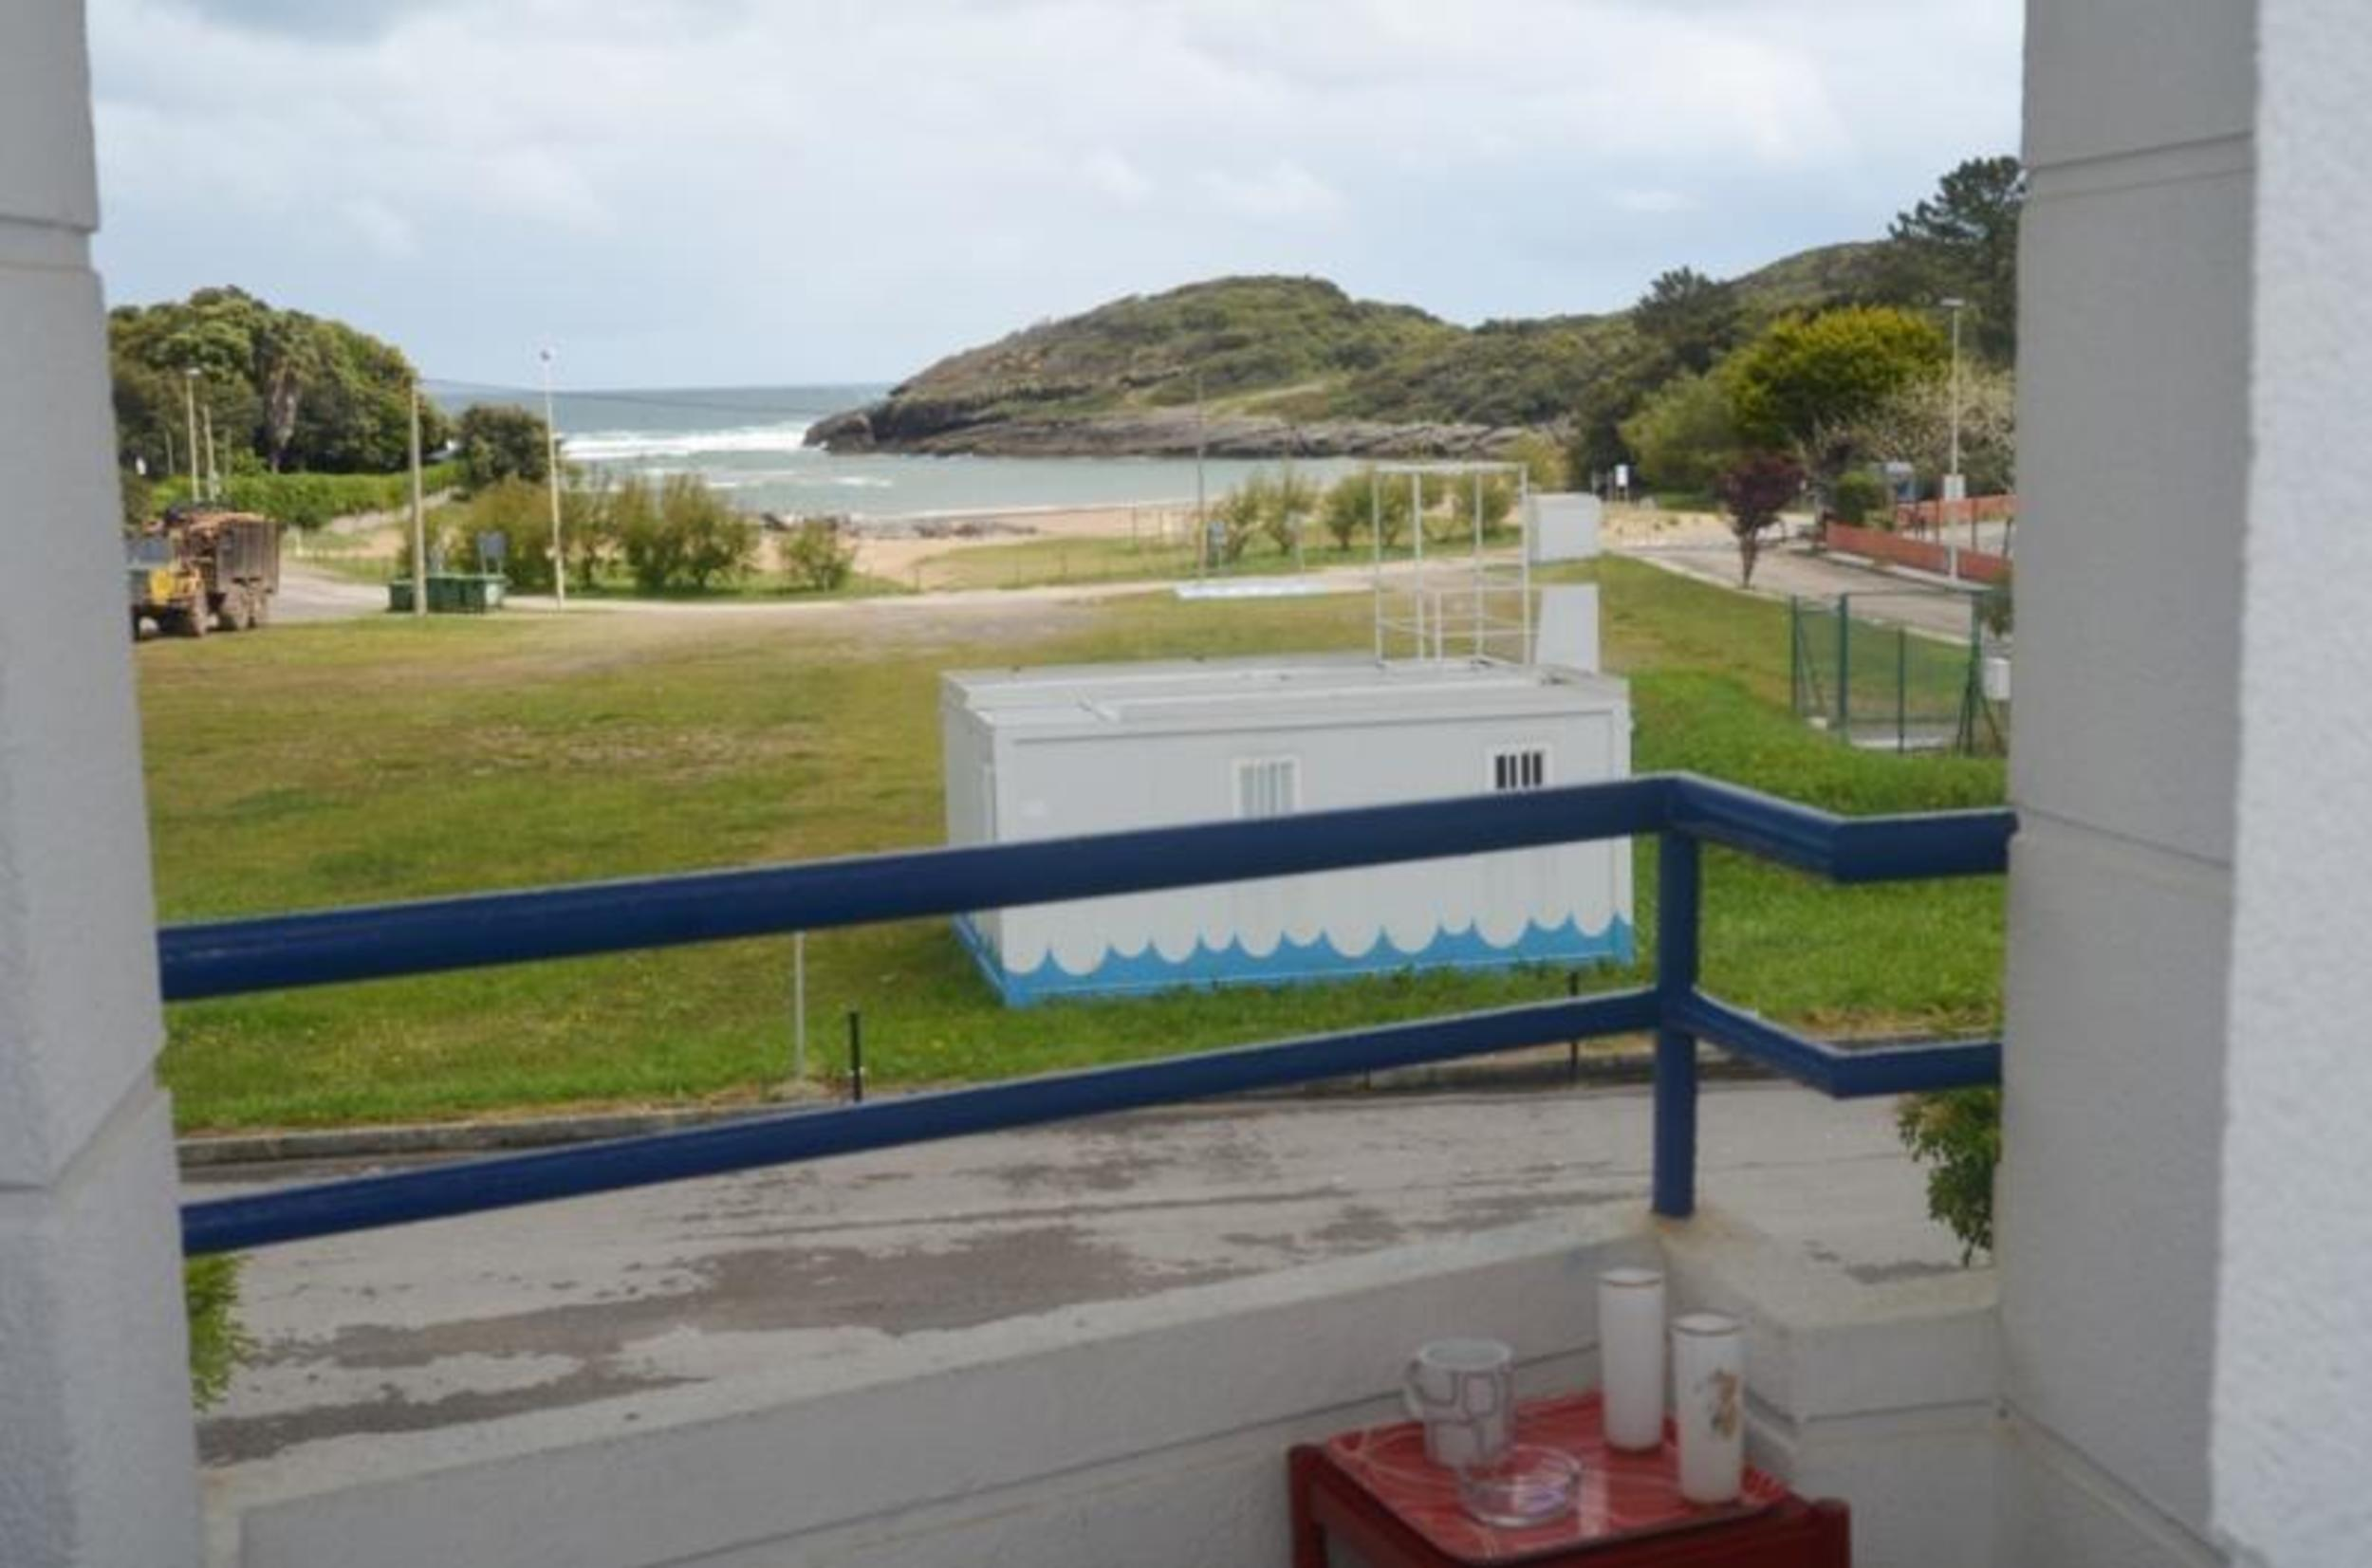 Ferienwohnung Apartment - 2 Bedrooms with Pool and Sea views - 102761 (2360861), Isla, Costa de Cantabria, Kantabrien, Spanien, Bild 7